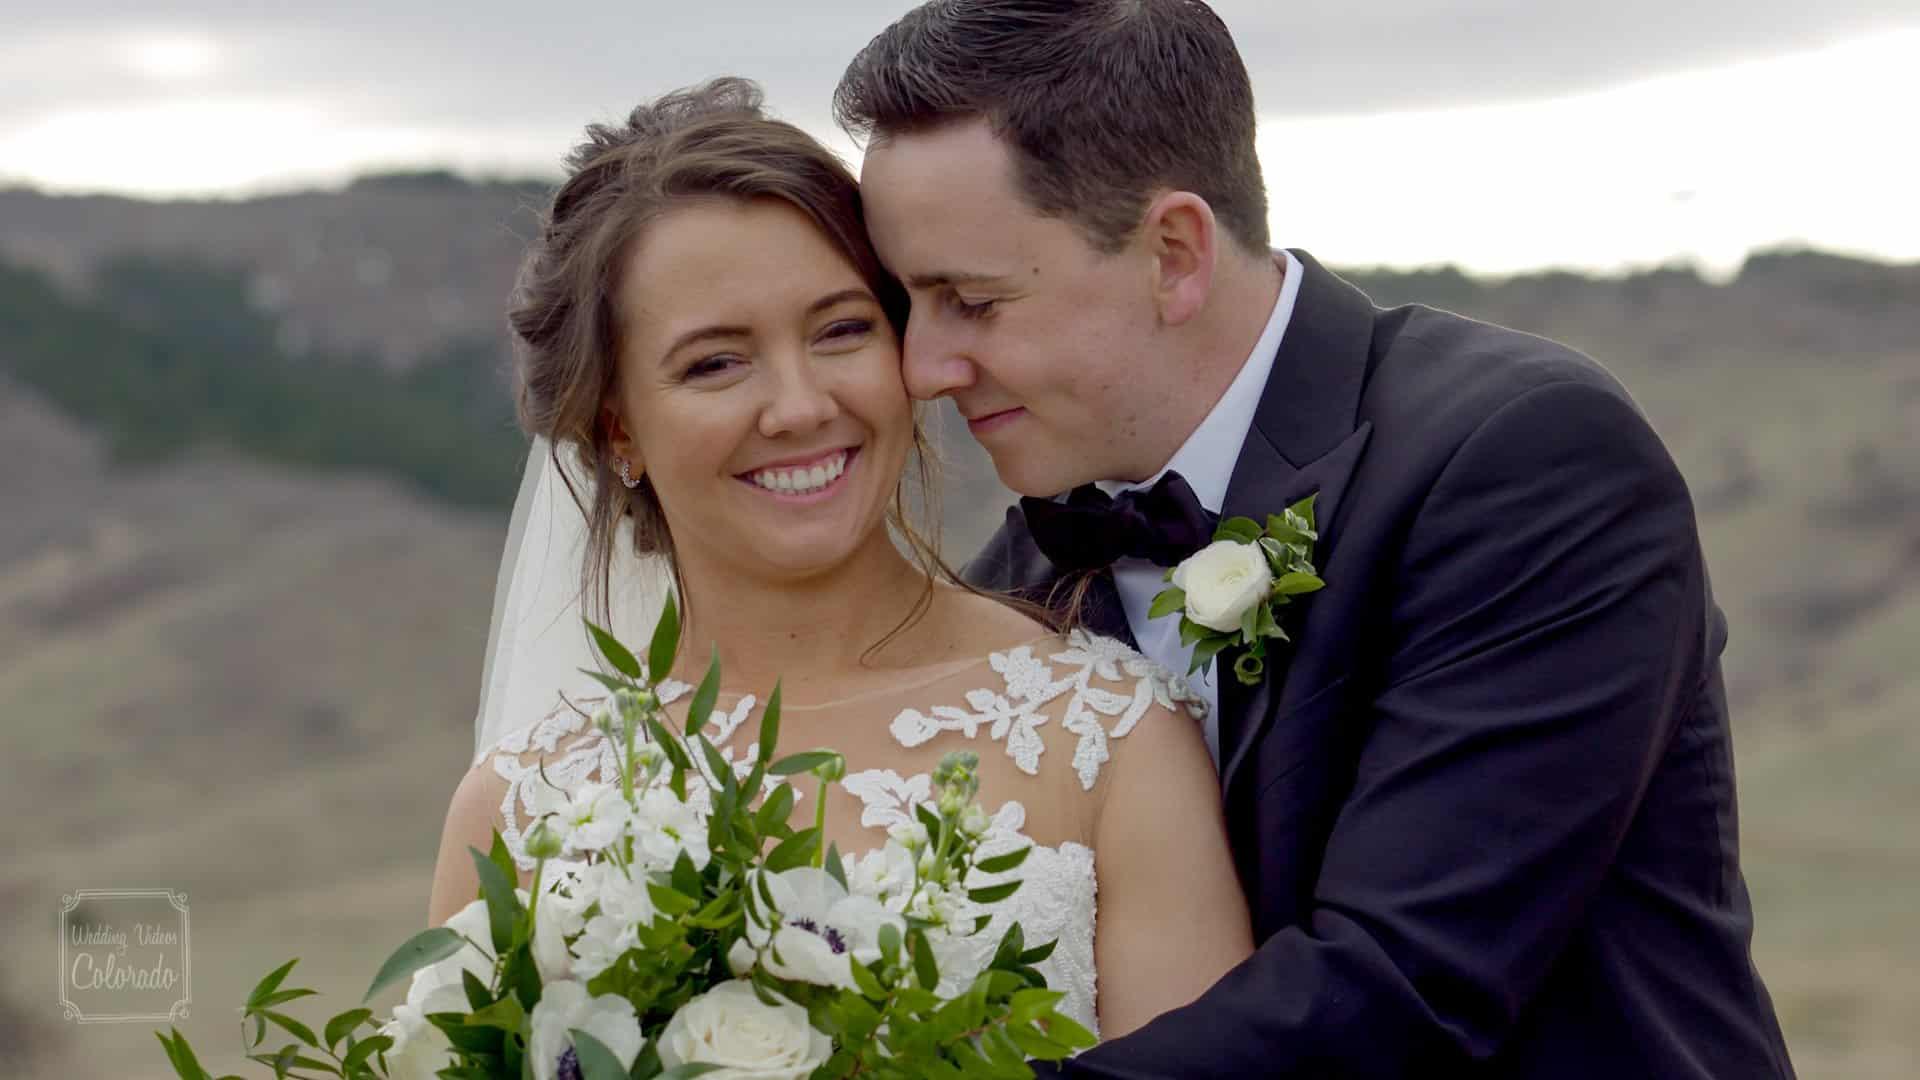 Alex Haley The Manor House Wedding Videographer